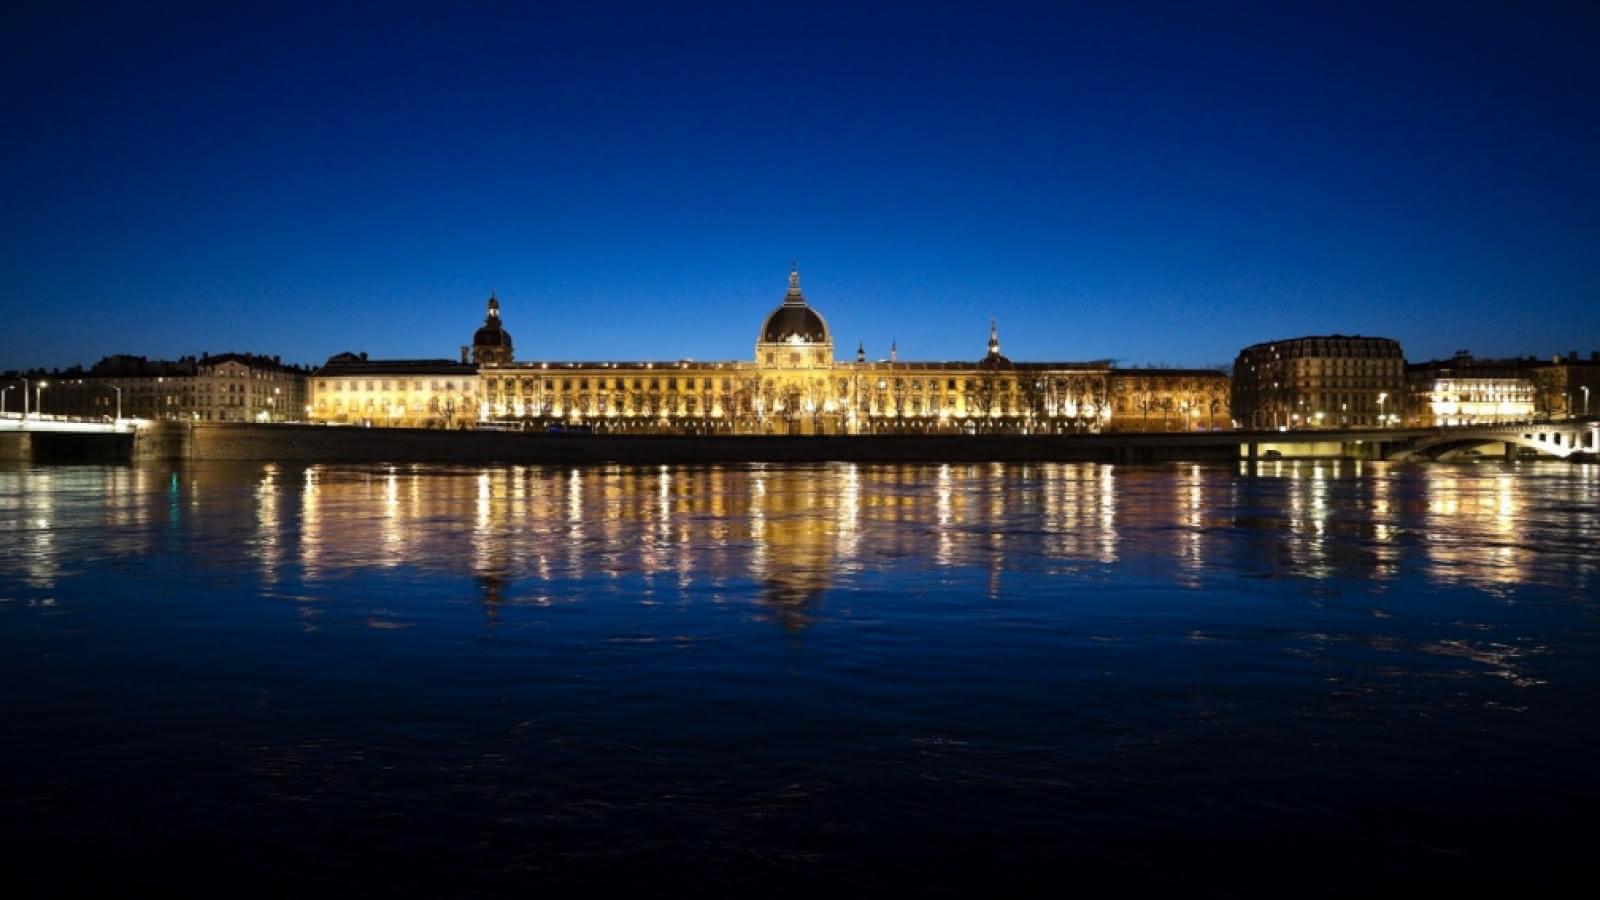 Hôtel Dieu by night